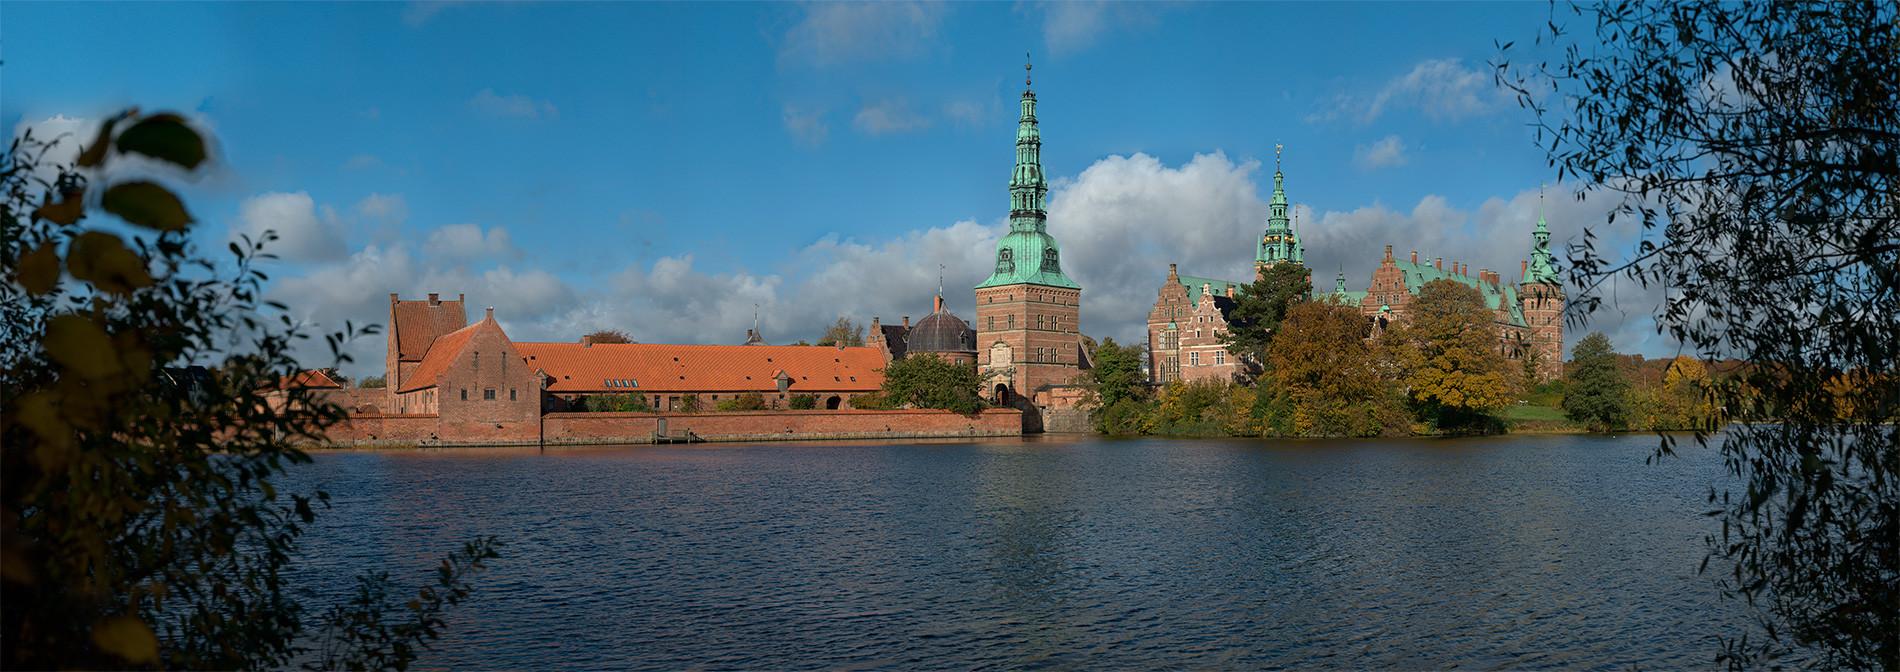 Frederiksborg Slot, Hillerød